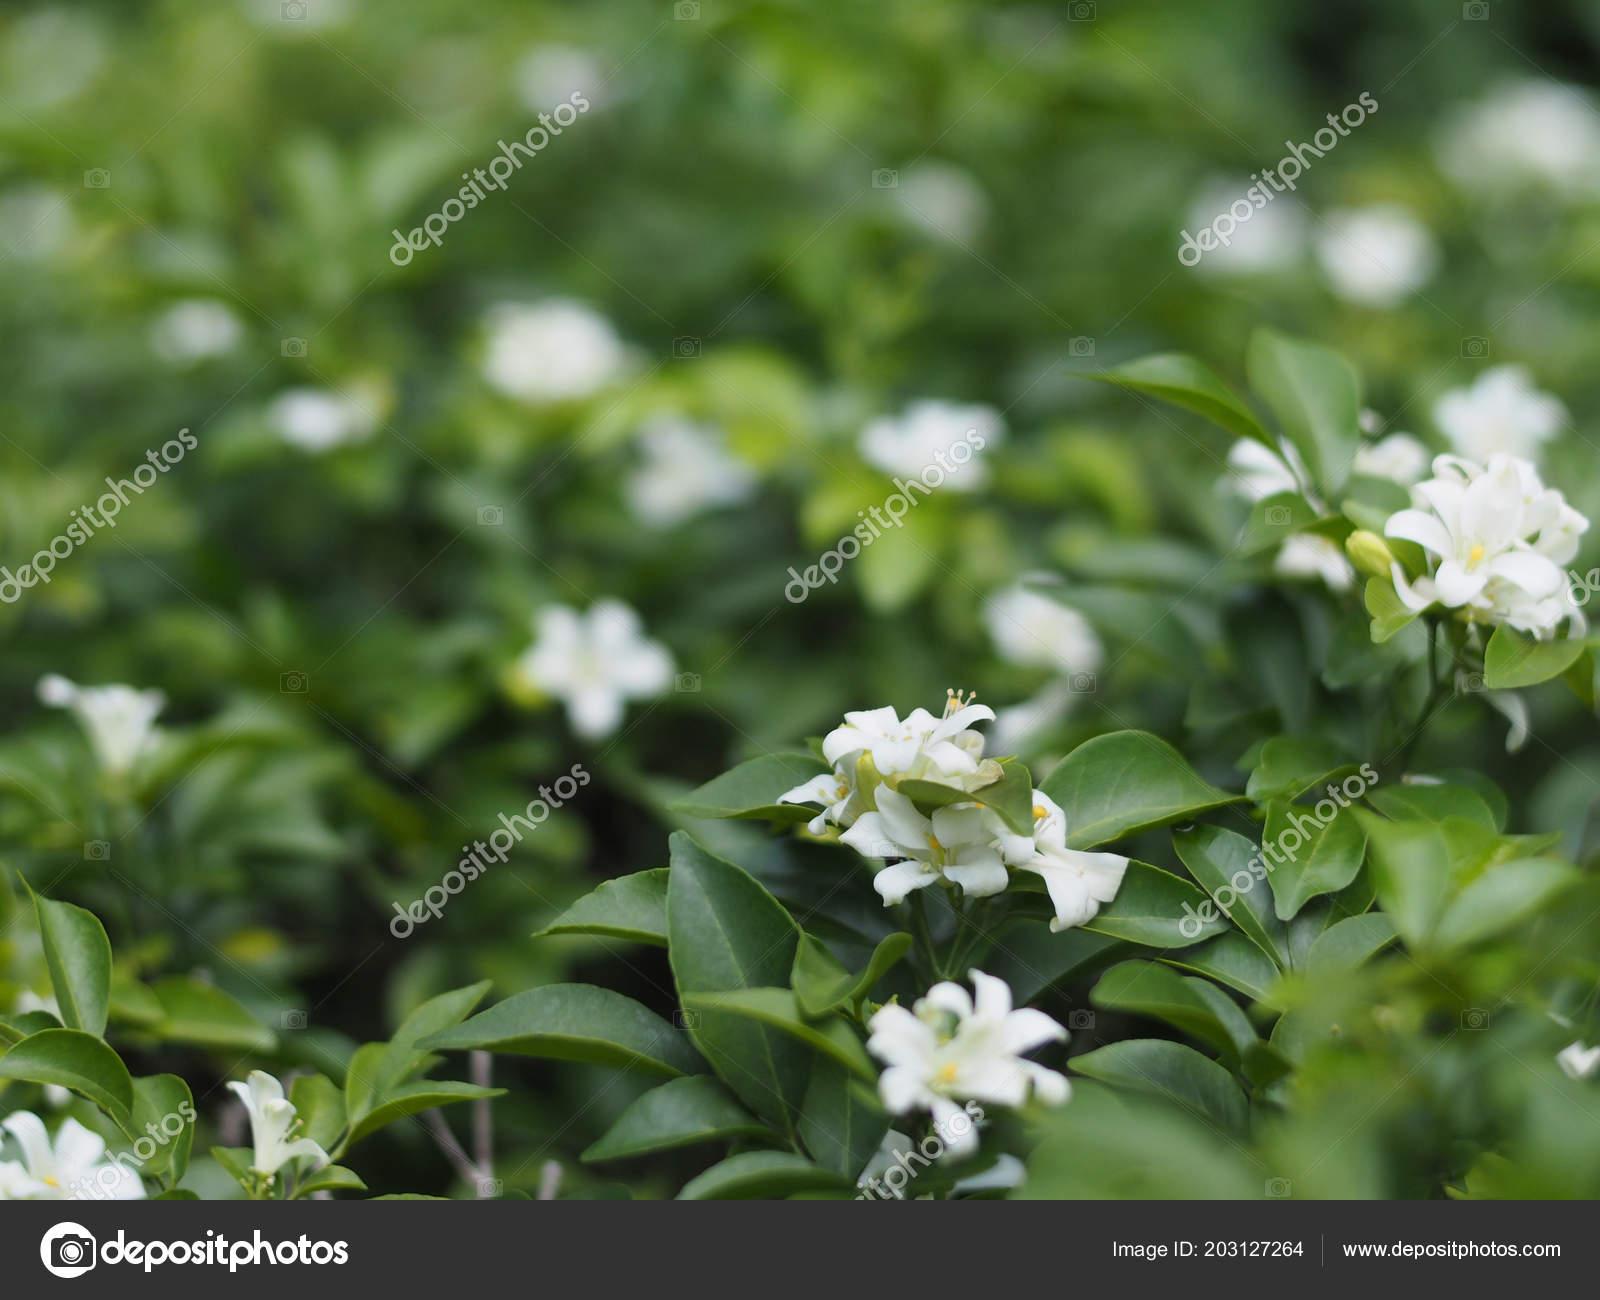 Small White Flower Orange Jasmine Plant Satin Wood Green Leaves